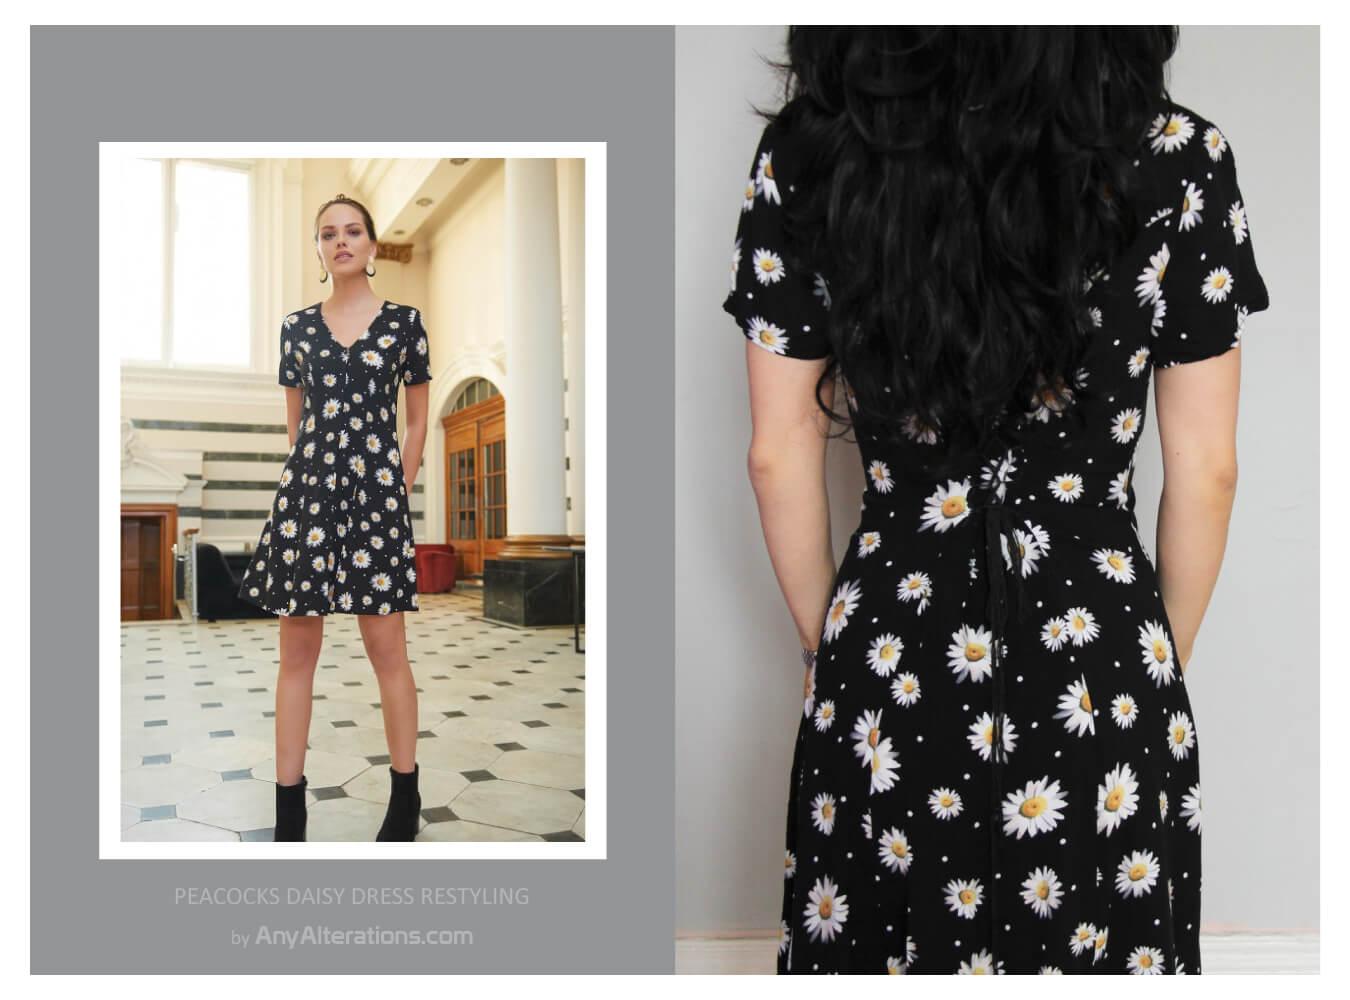 Peacocks-Daisy-Dress-Restyling-by-AnyAlterations.com-01